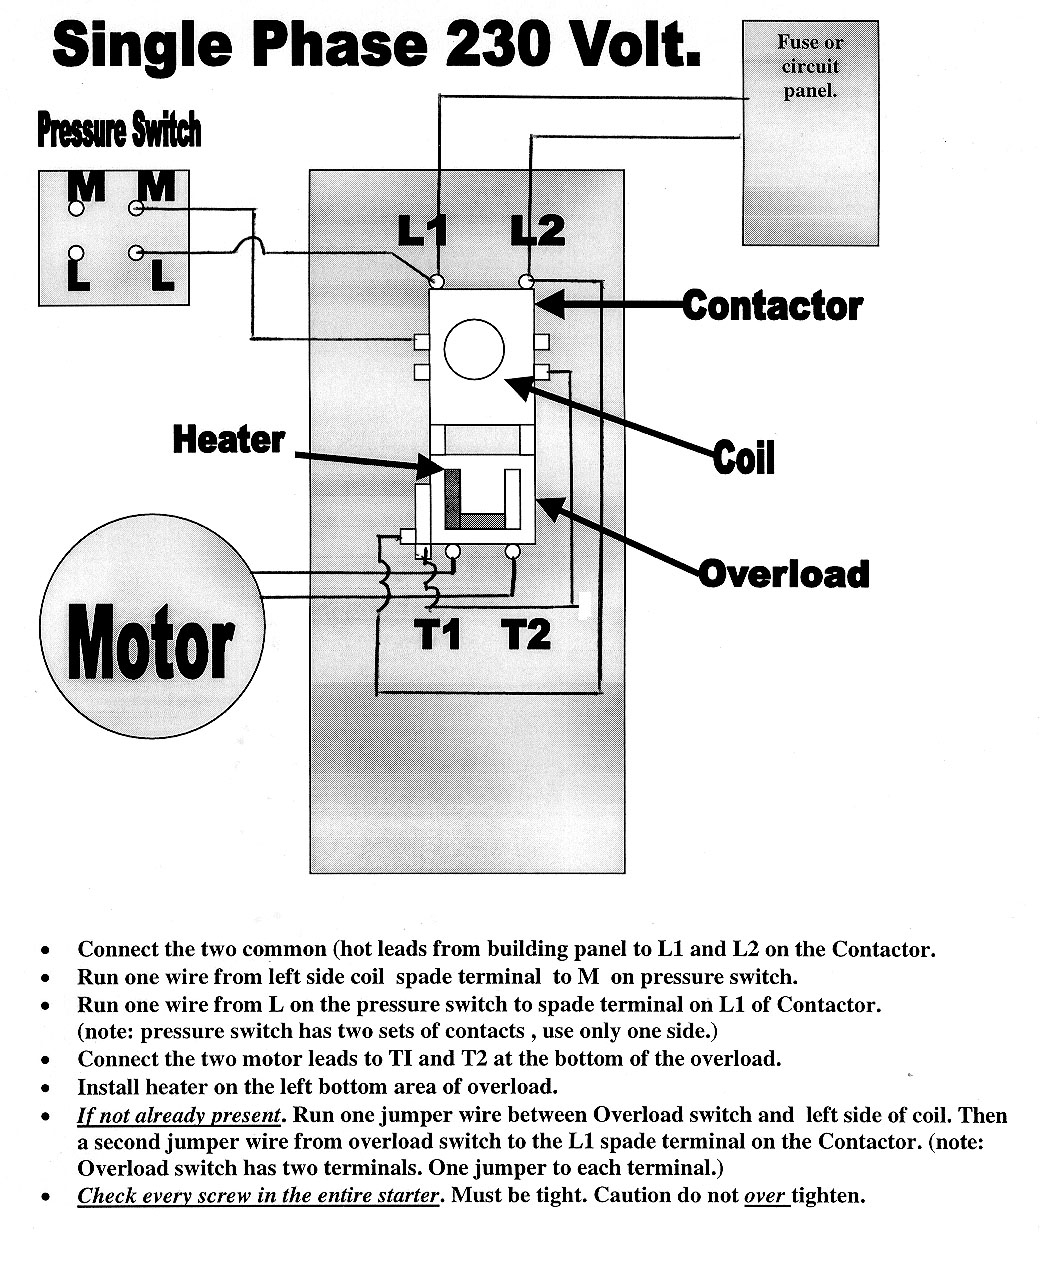 Square D Starters - Square D Motor Starter Wiring Diagram